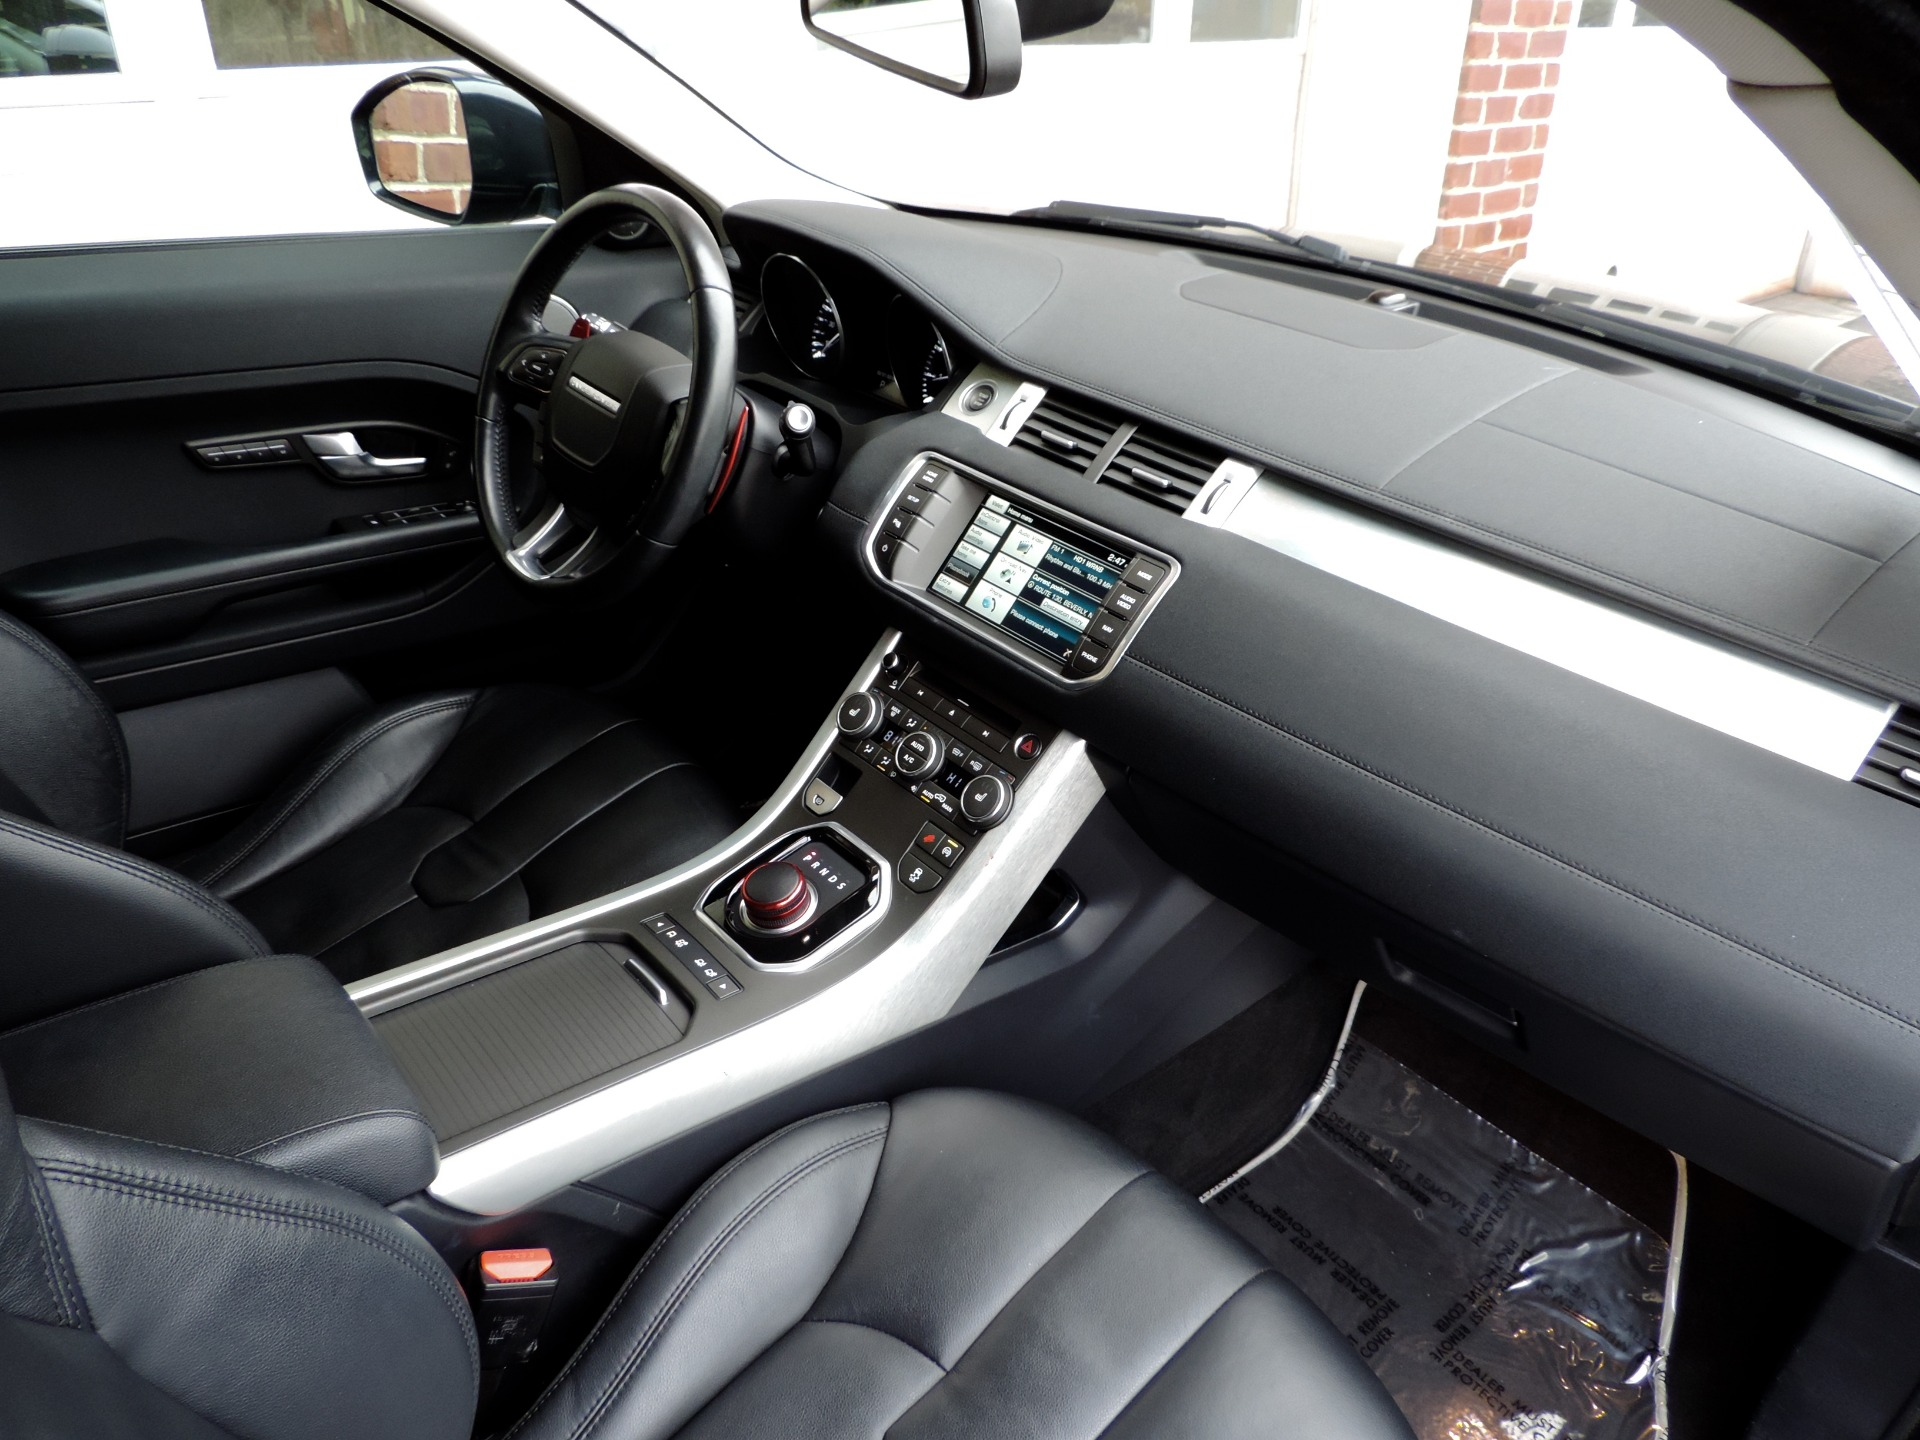 2015 Land Rover Range Rover Evoque Pure Plus Stock # 039478